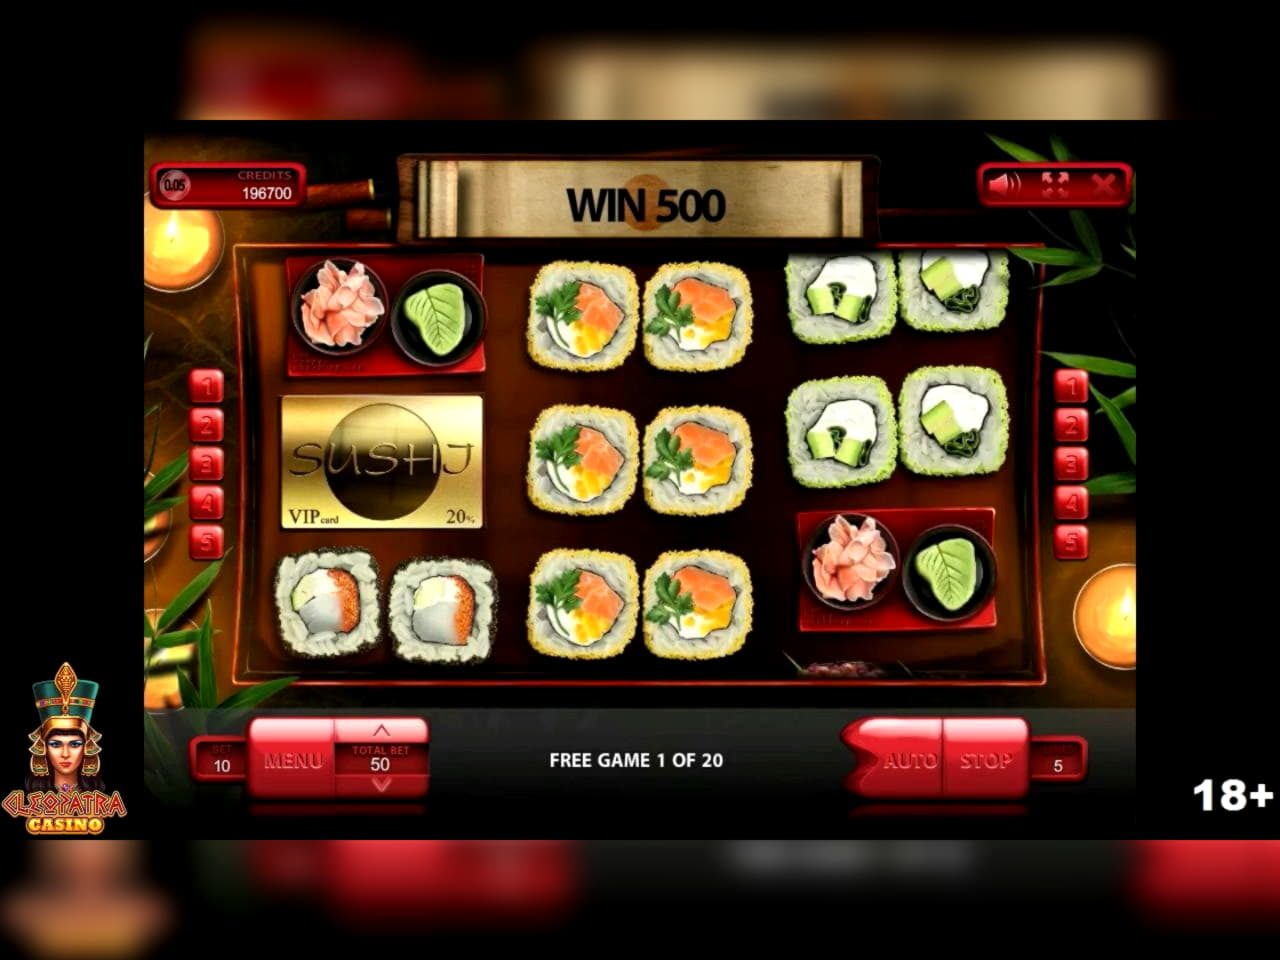 EURO 3280 NO DEPOSIT at Berlin Casino